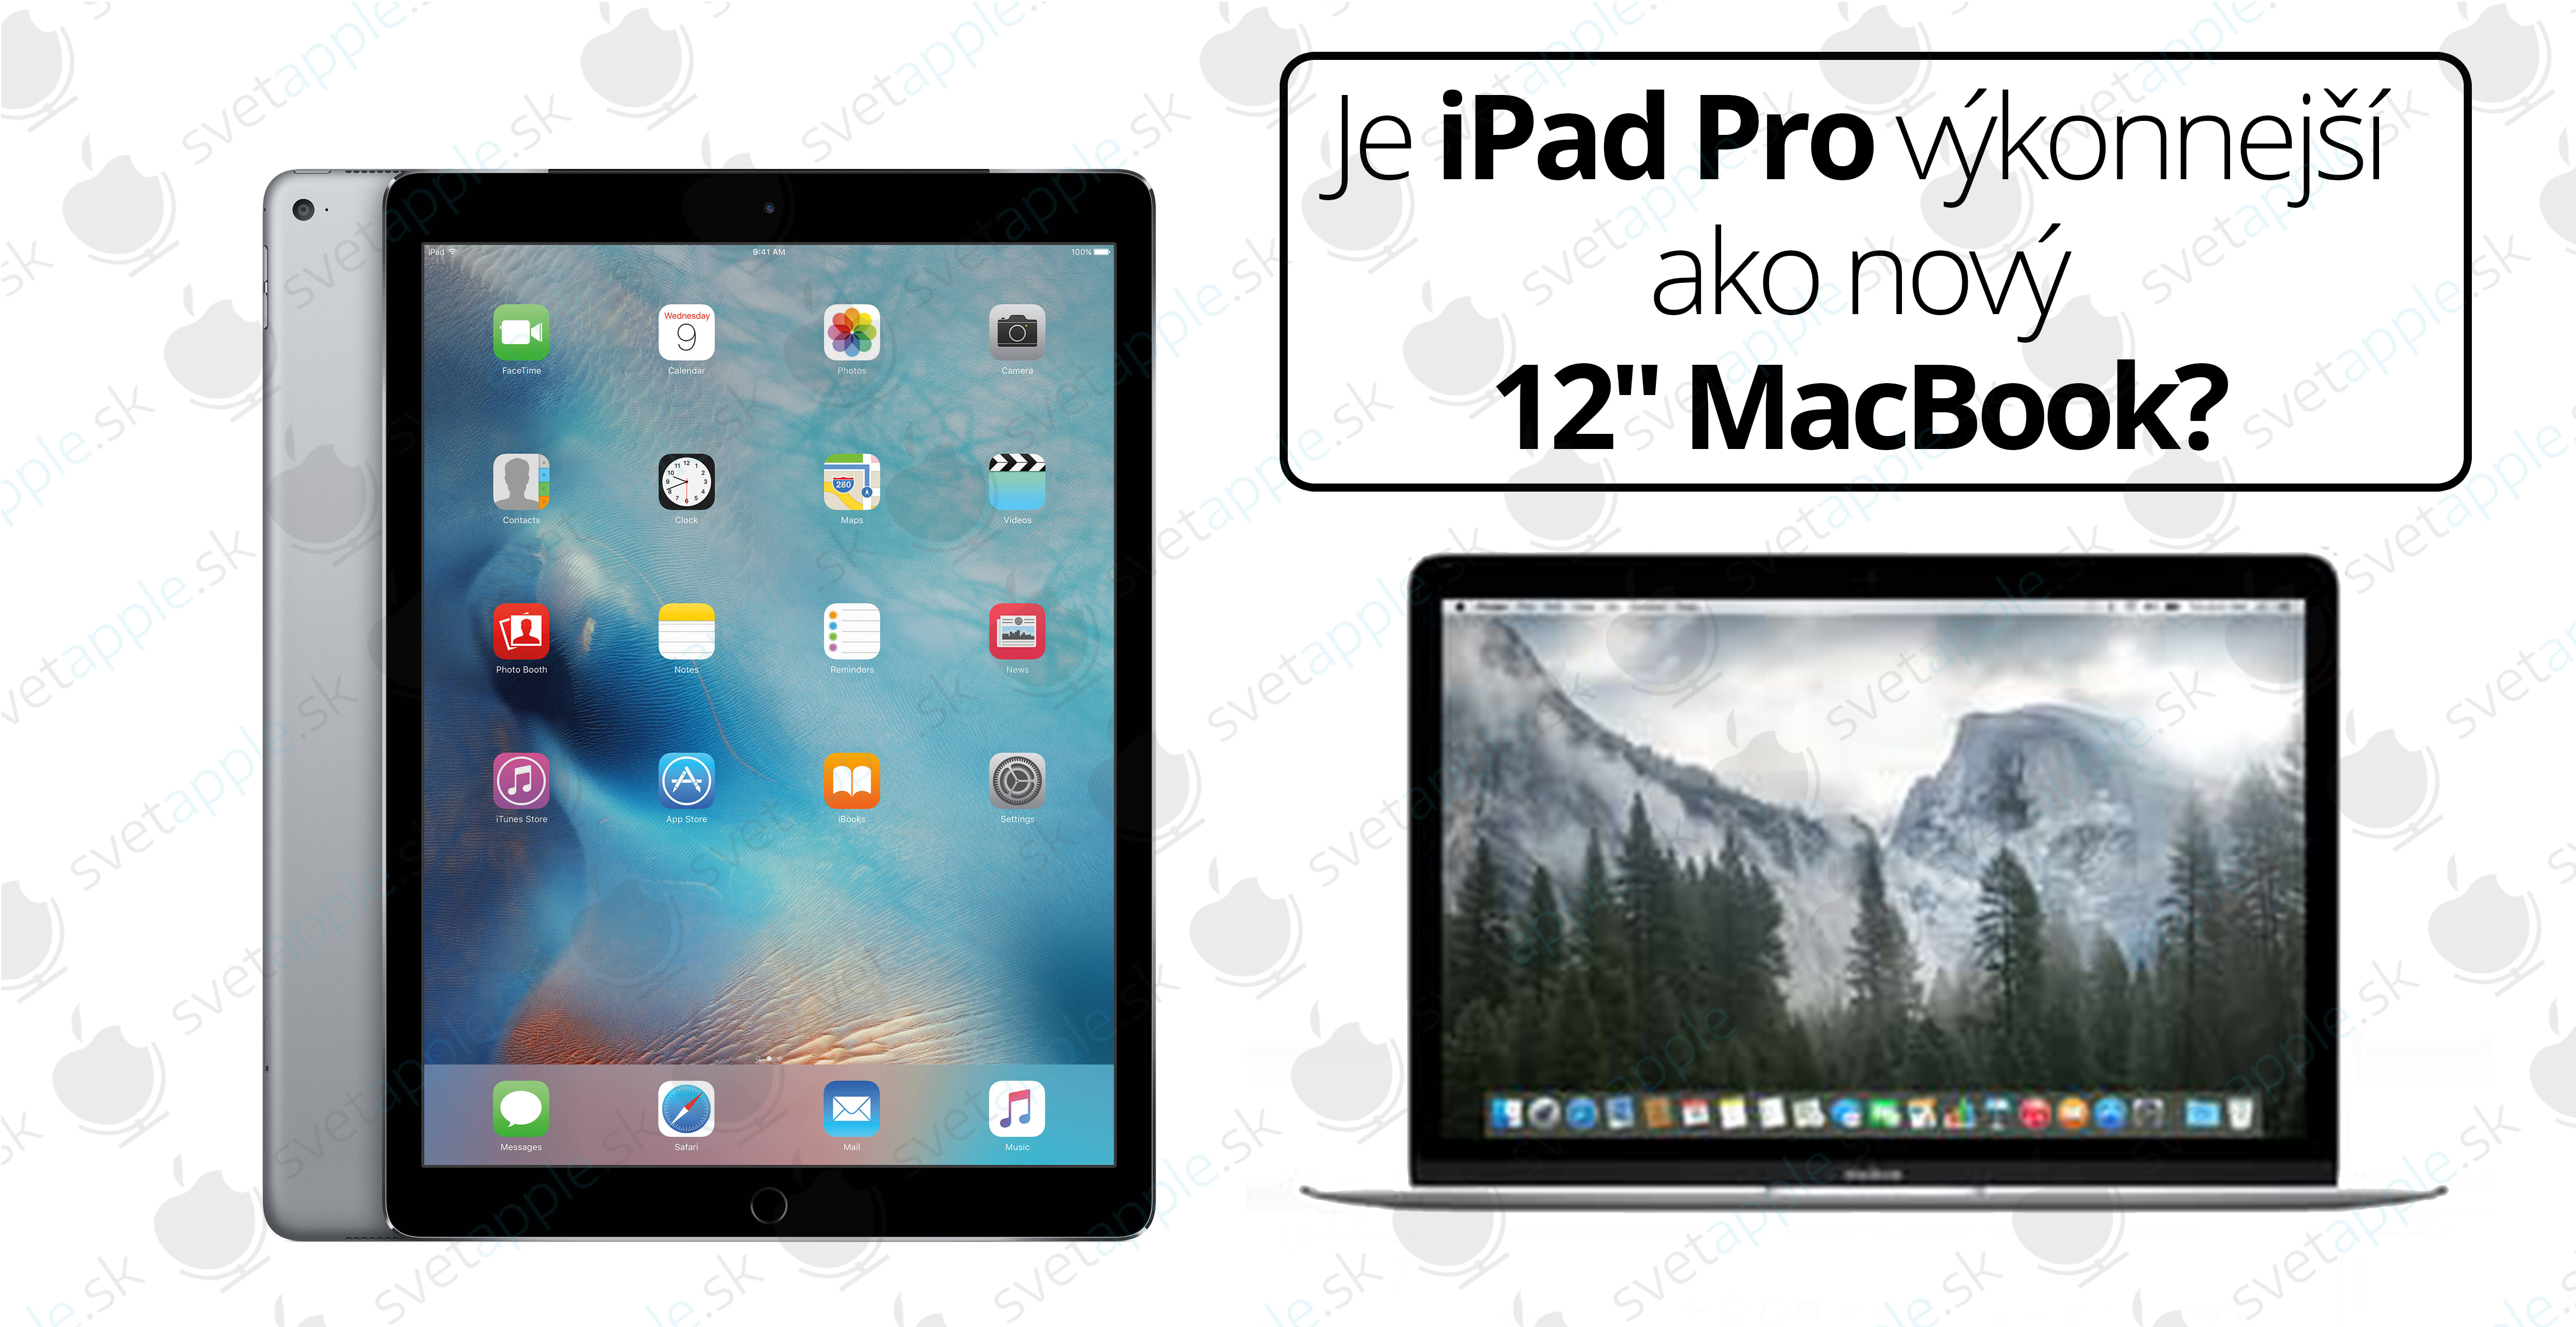 iPad-Pro-vs-12-mackbook---titulná-fotografia---SvetApple